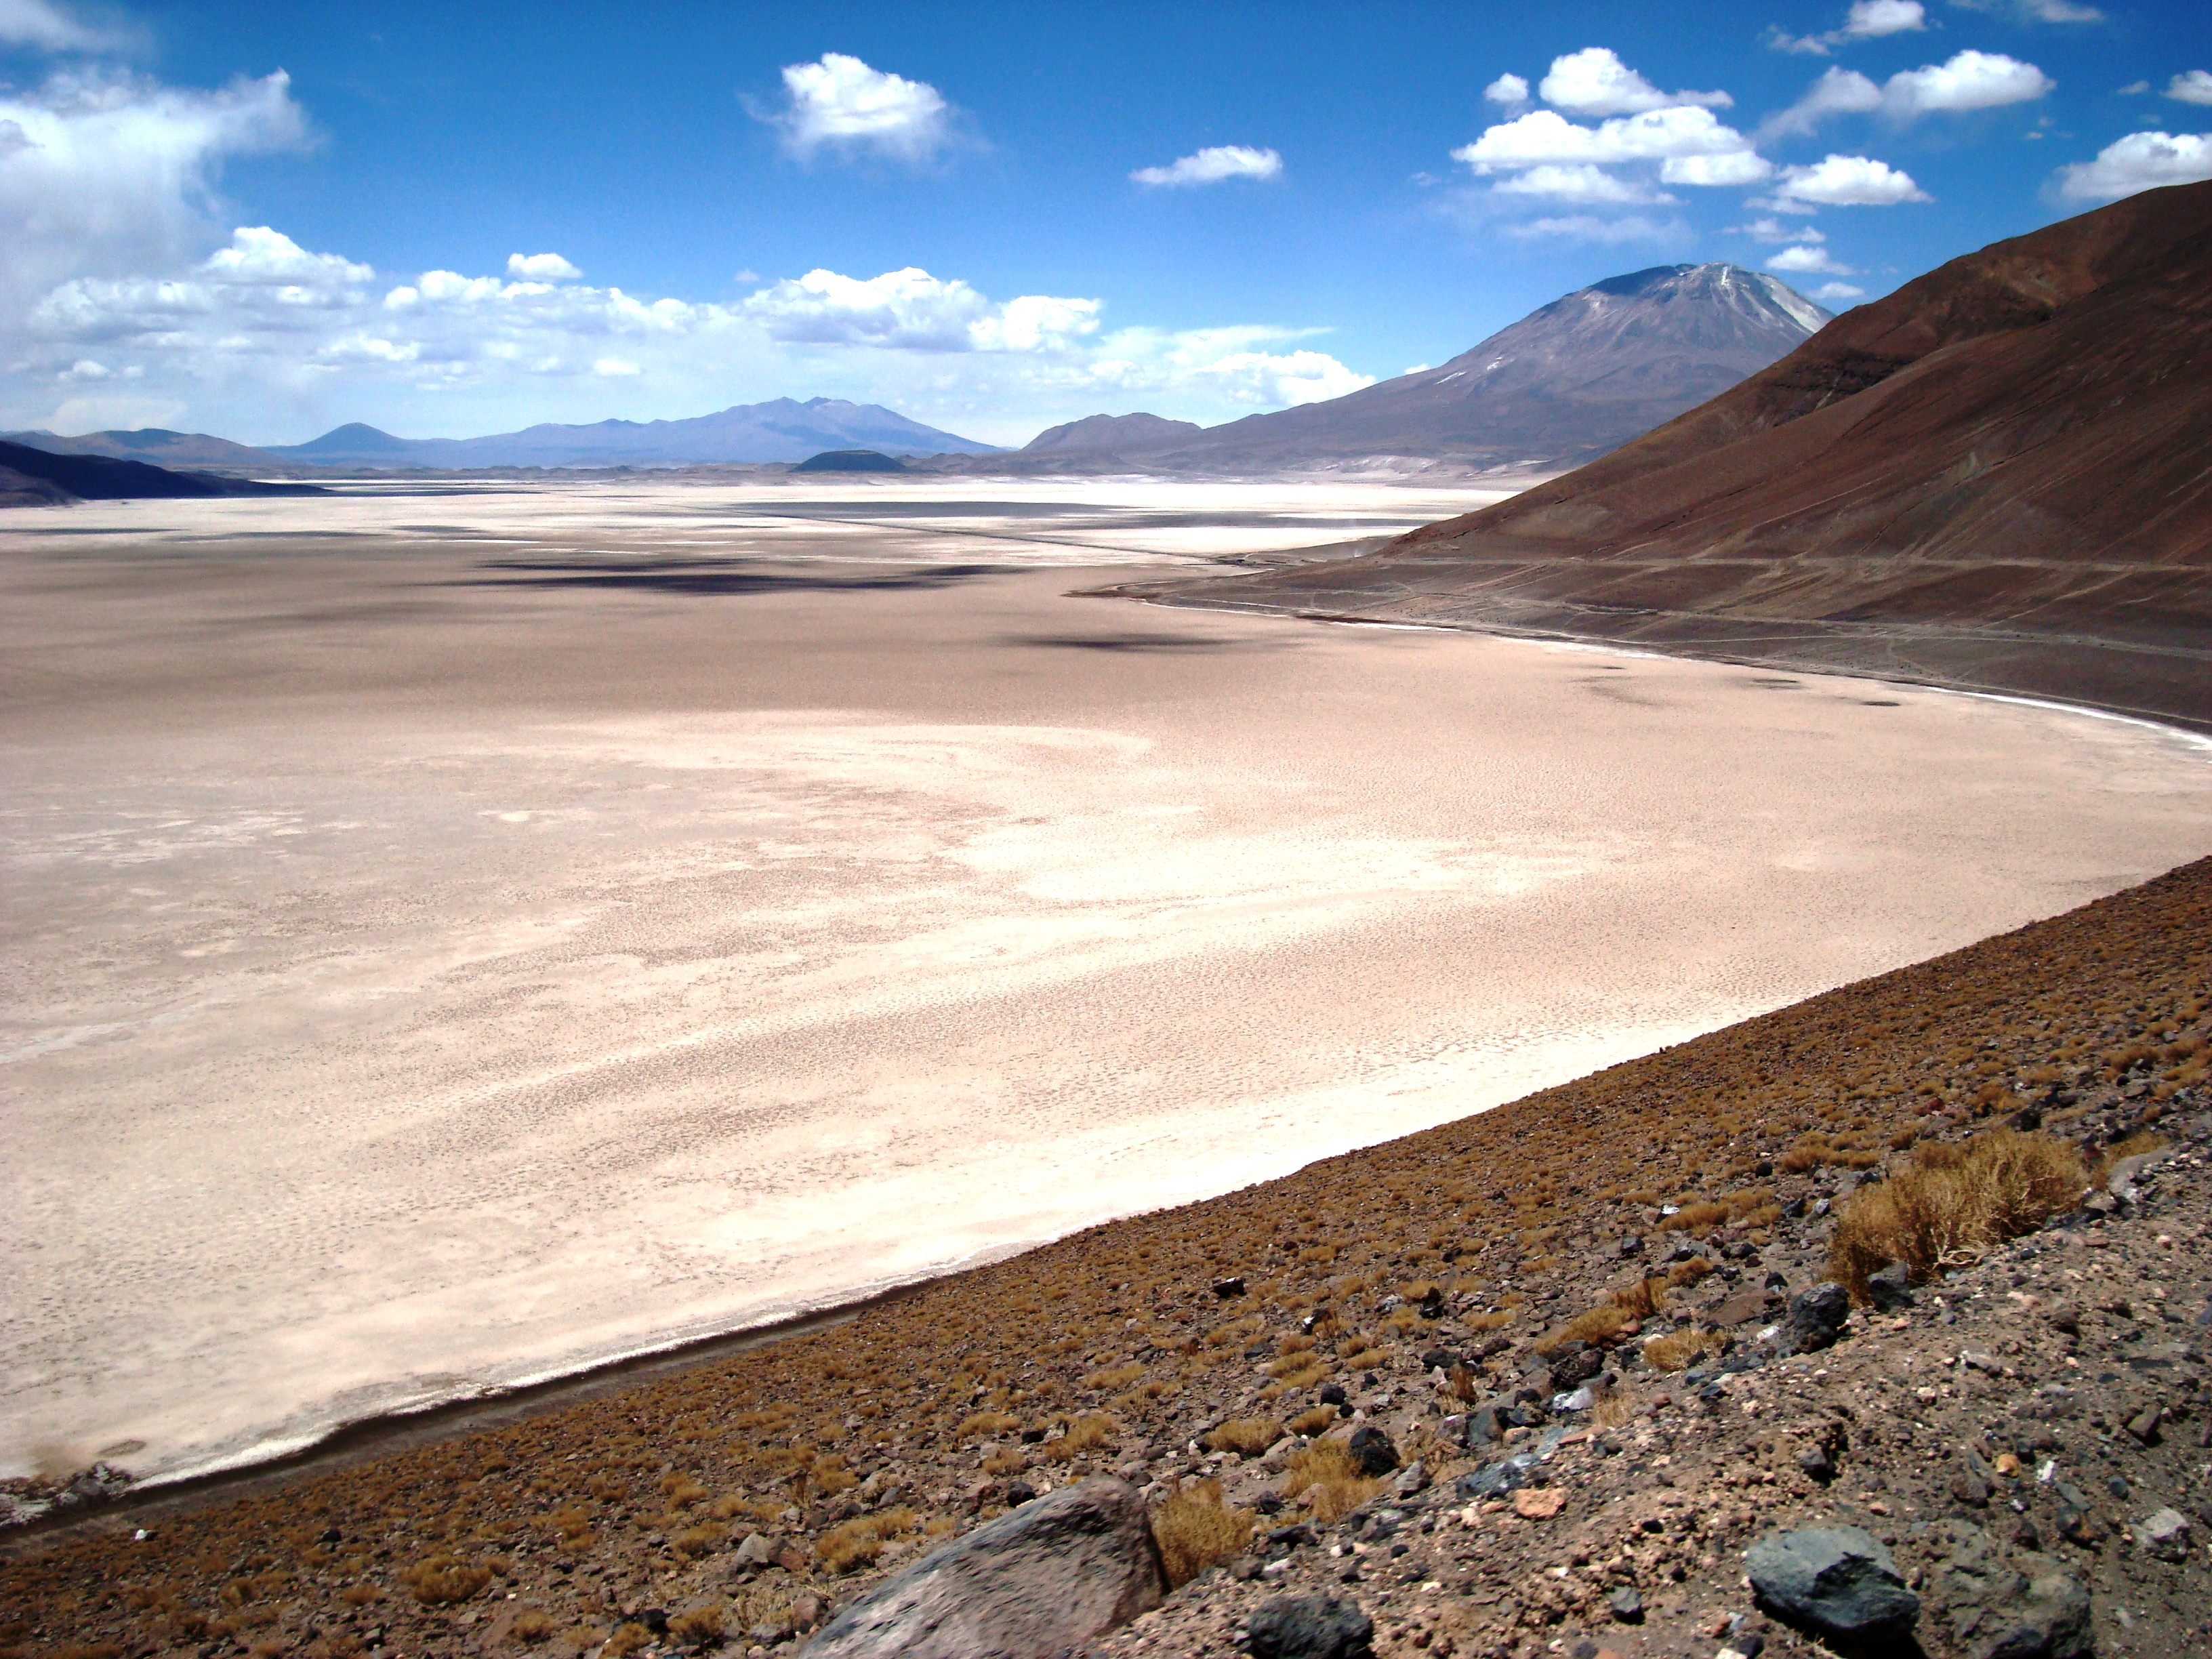 Desierto de Atacama 3. JOHAN RAMÍREZ